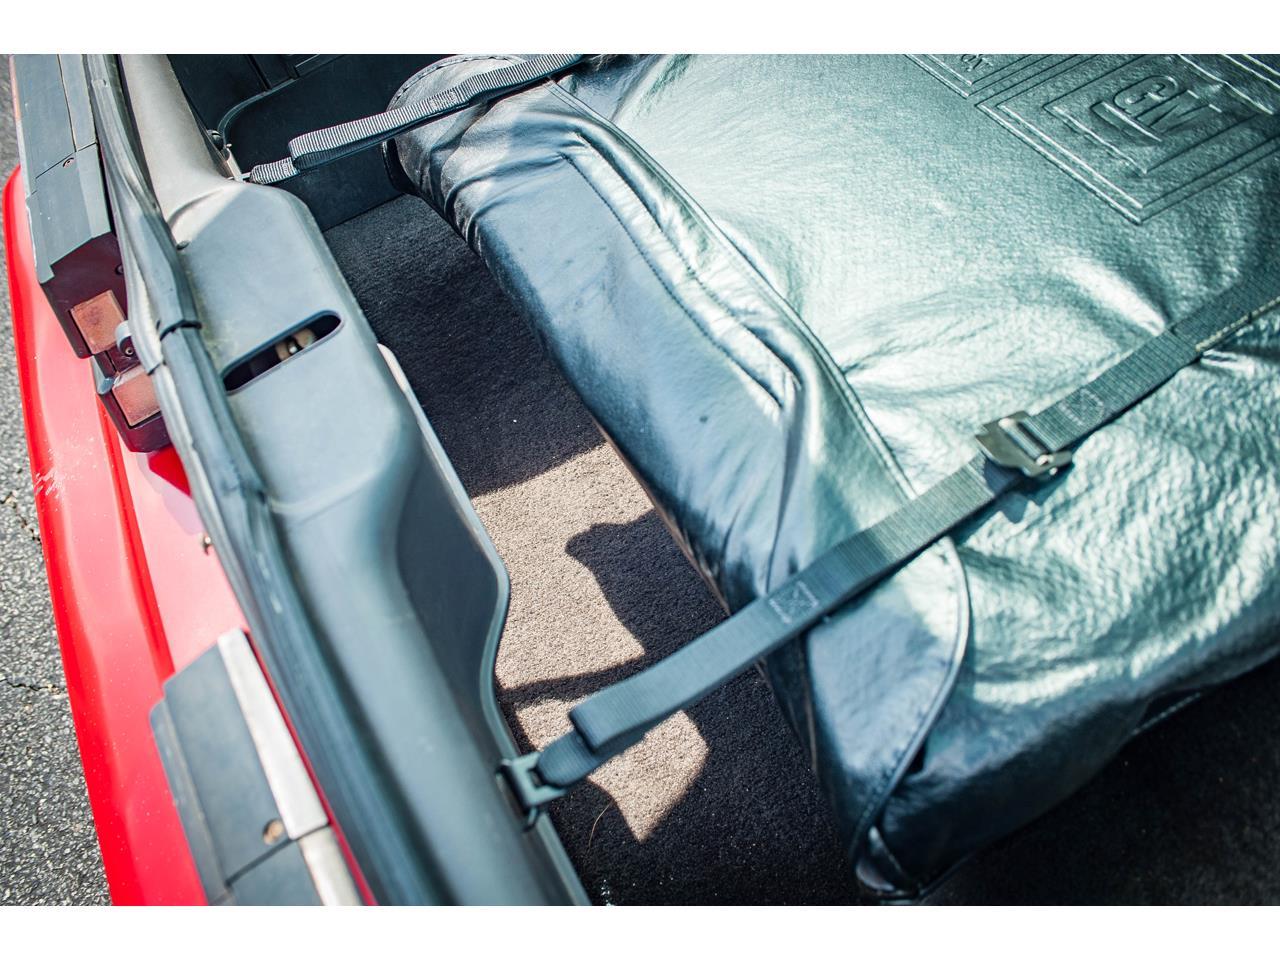 Large Picture of '84 Camaro located in O'Fallon Illinois - $9,500.00 - QB9Y